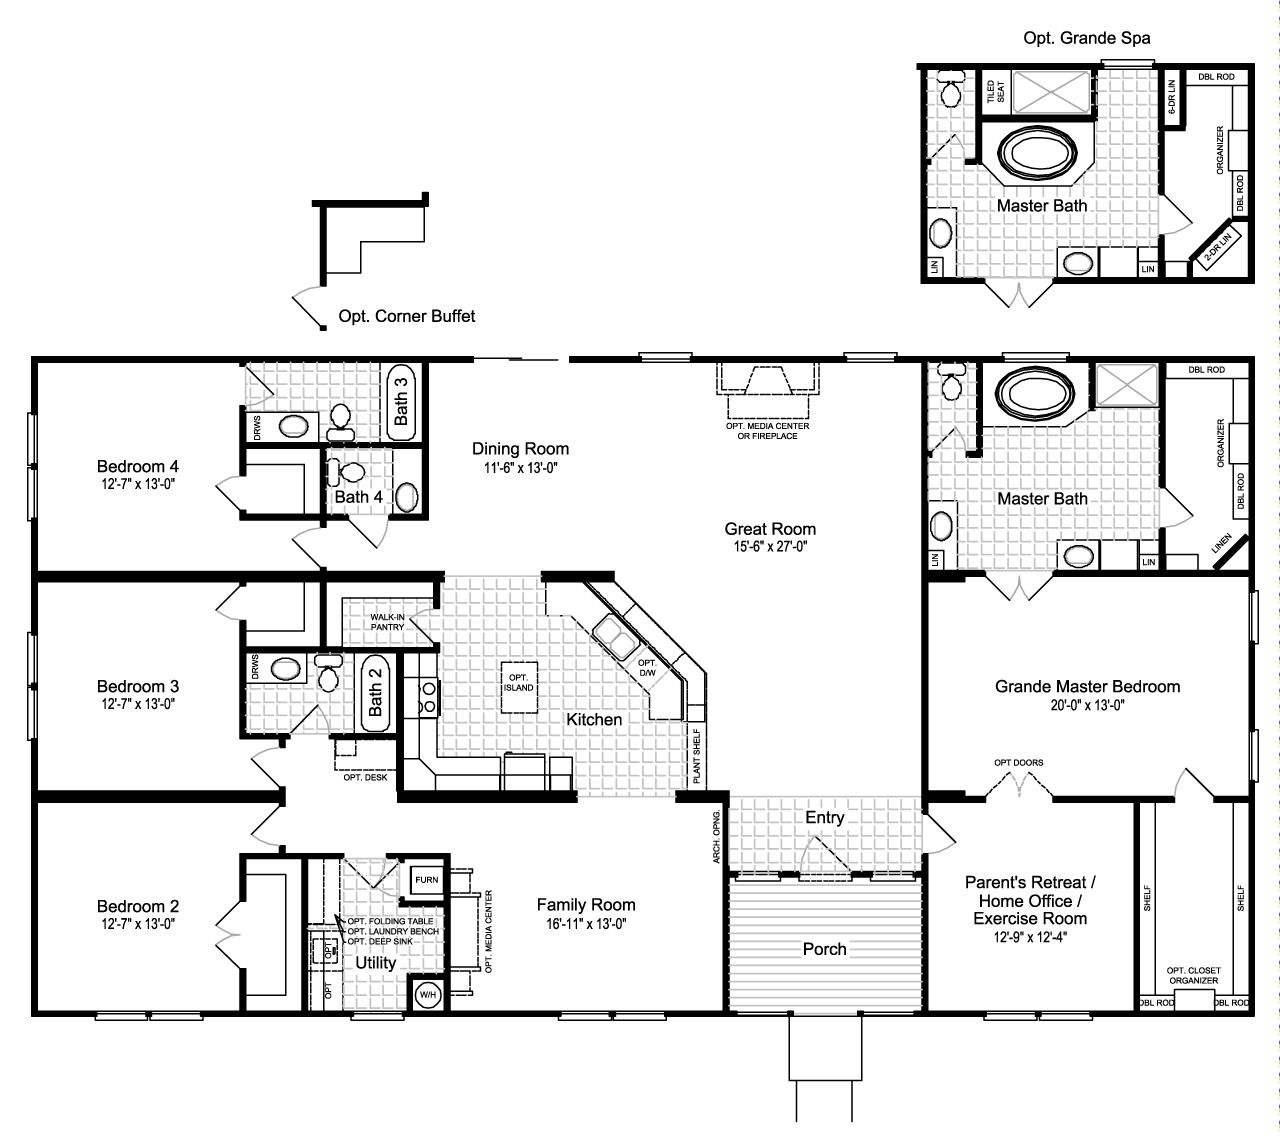 Fantastic Hacienda Iii Vrwd76d3 Standard Floor Plan With